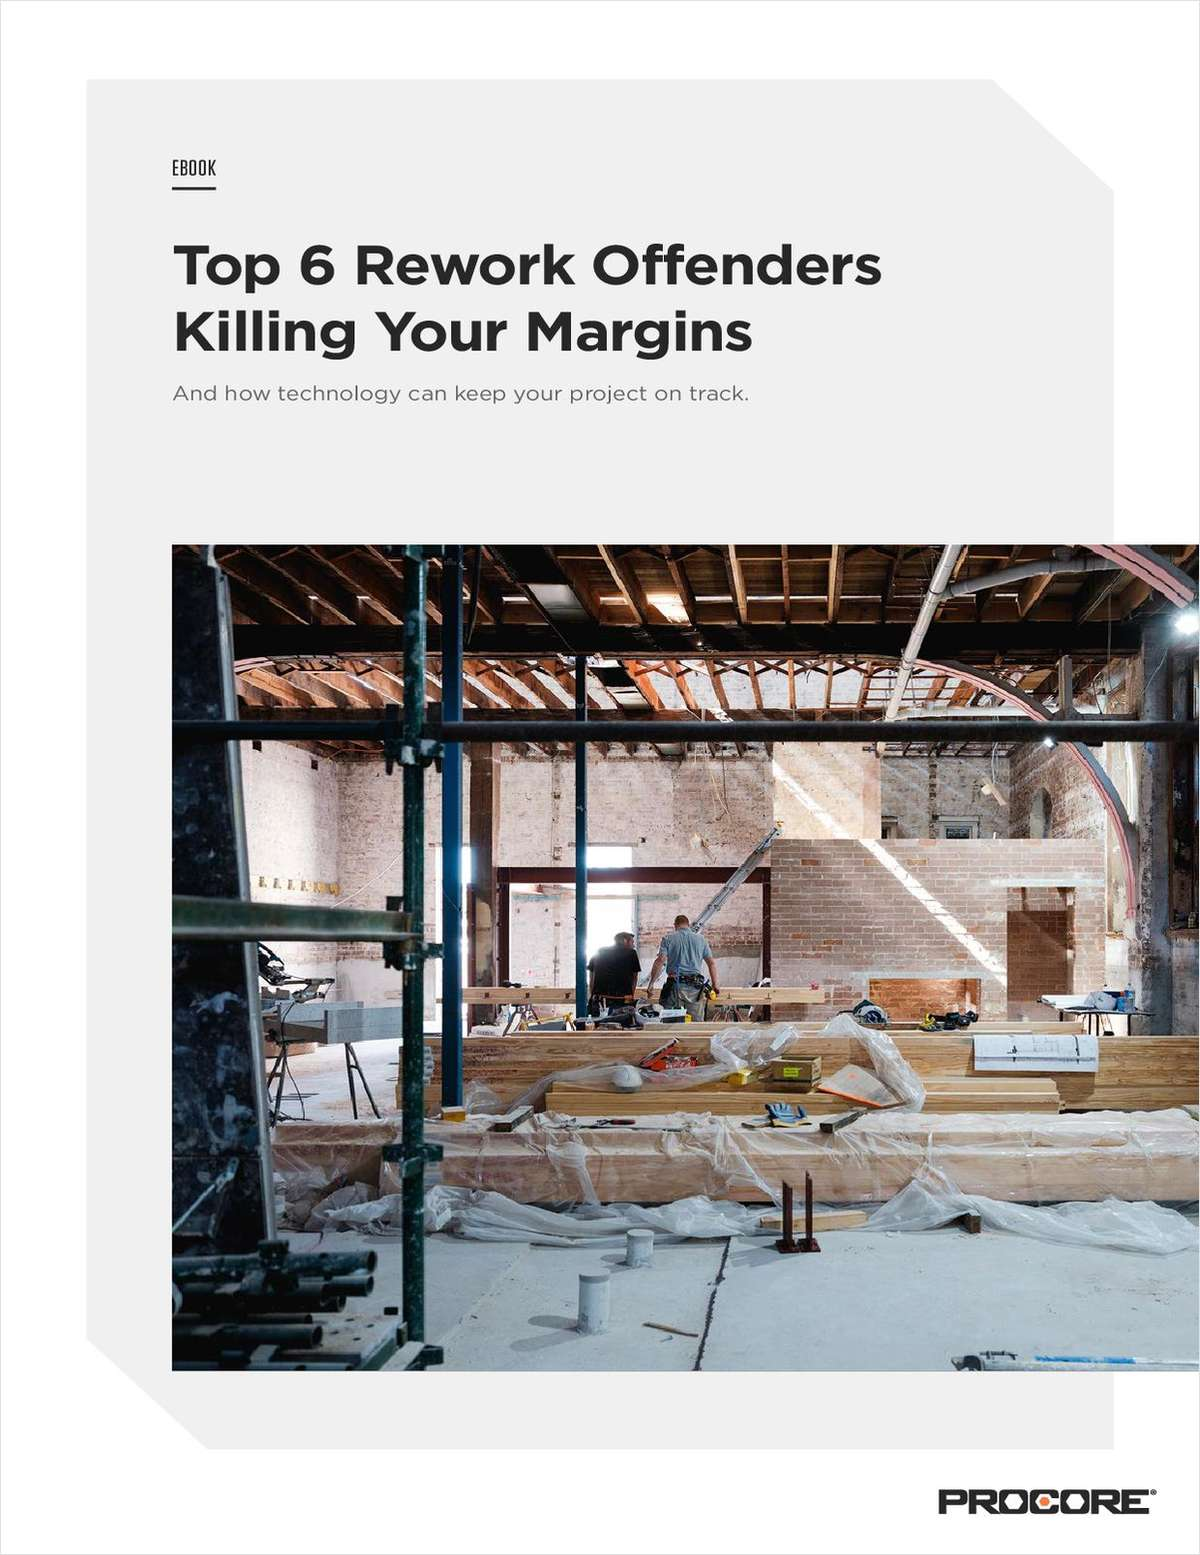 Top 6 Rework Offenders Killing Your Margins